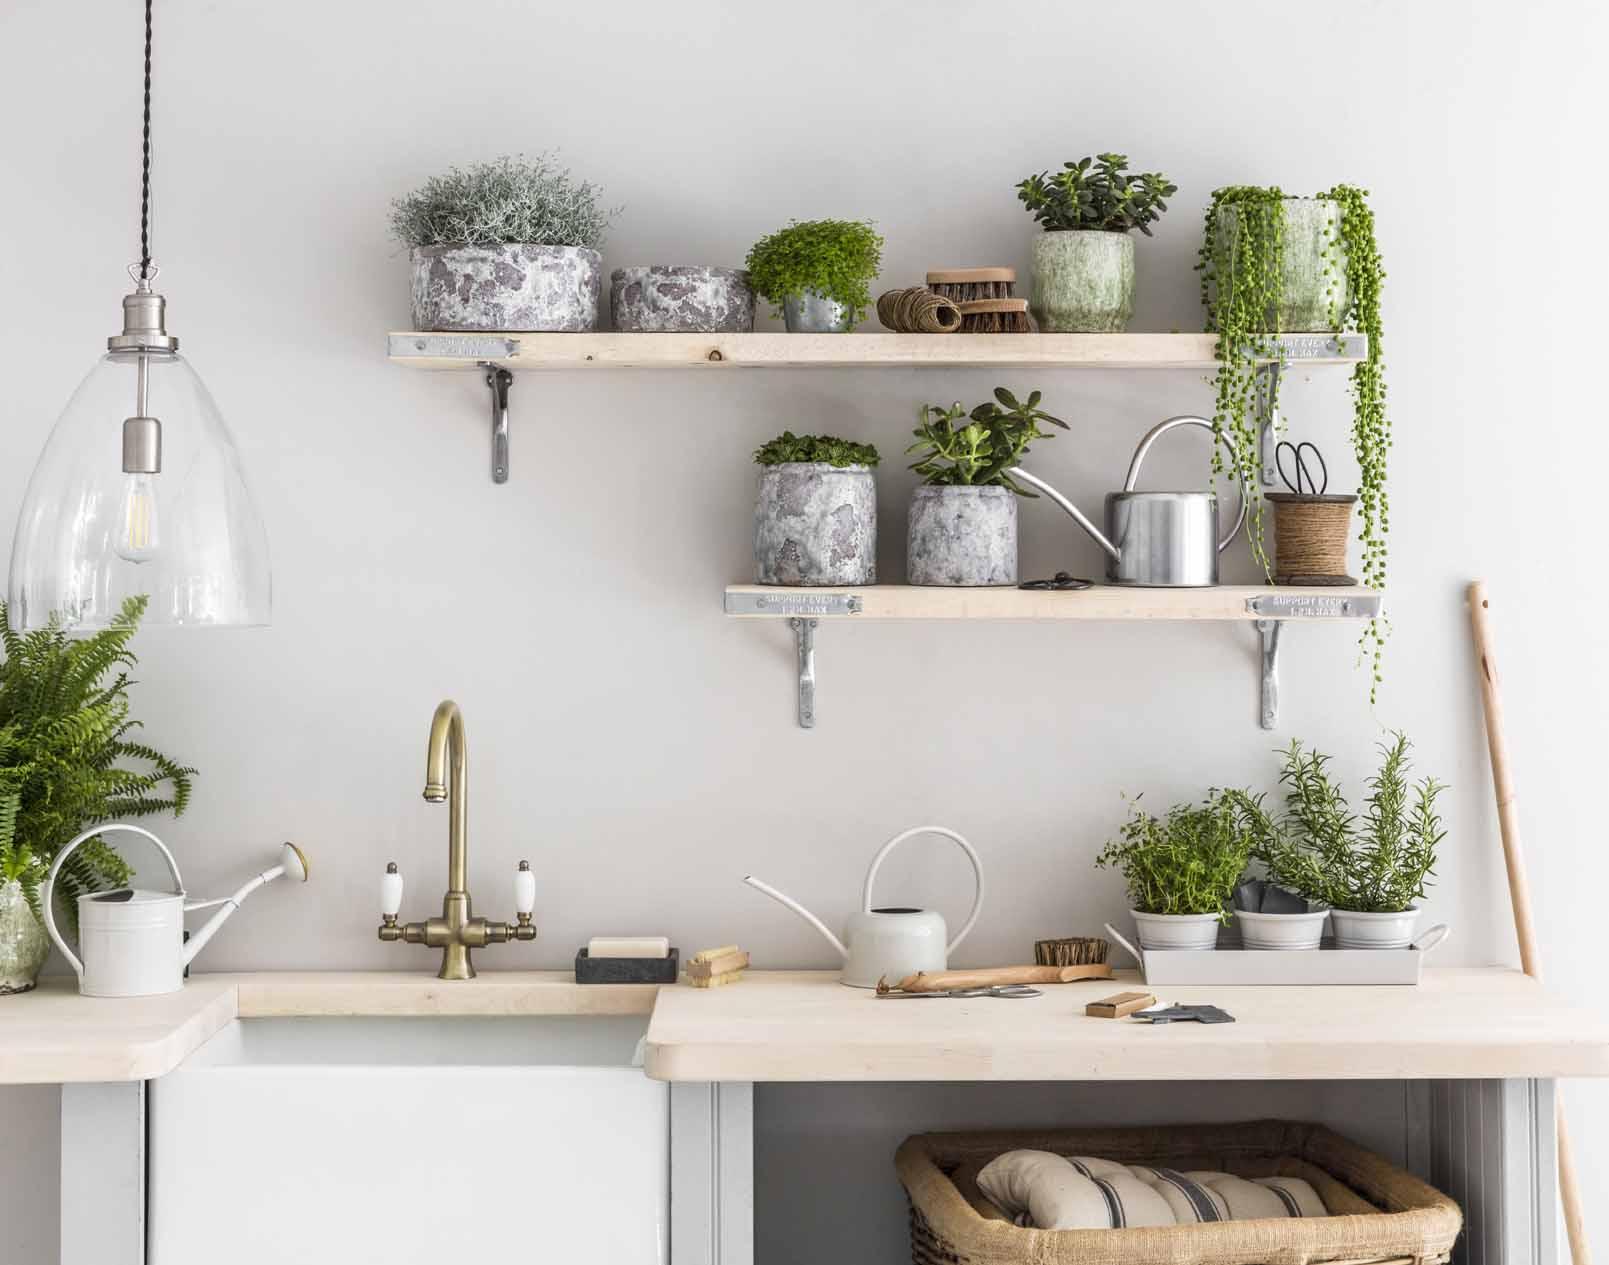 Adding-plants.. 80+ Unusual Kitchen Design Ideas for Small Spaces in 2021